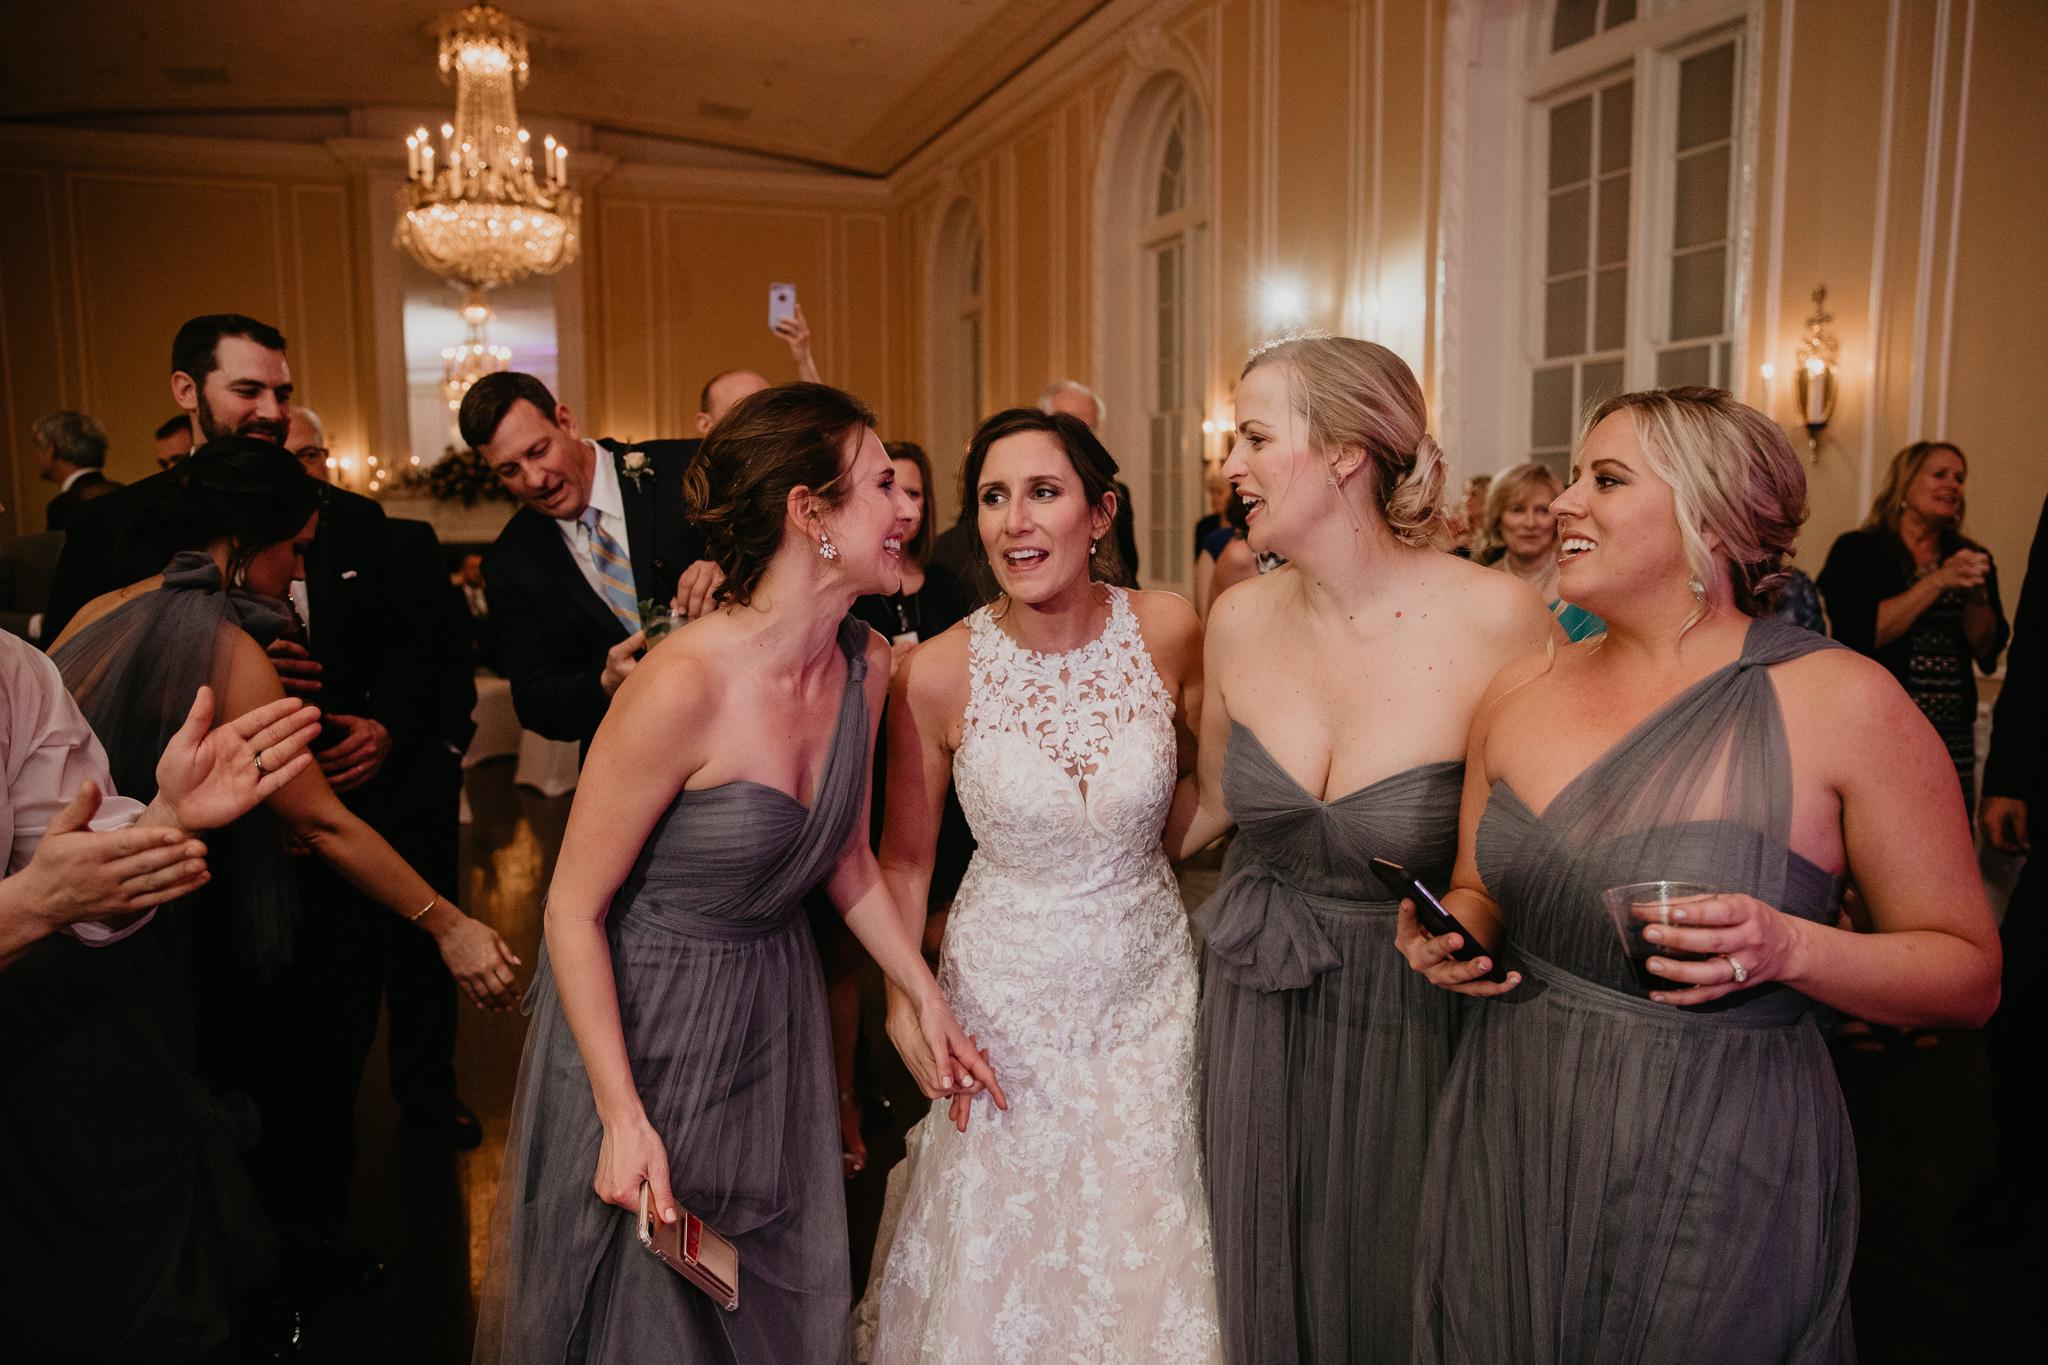 Patrick Henry Ballroom - Weddings - Virginia Wedding Photographe